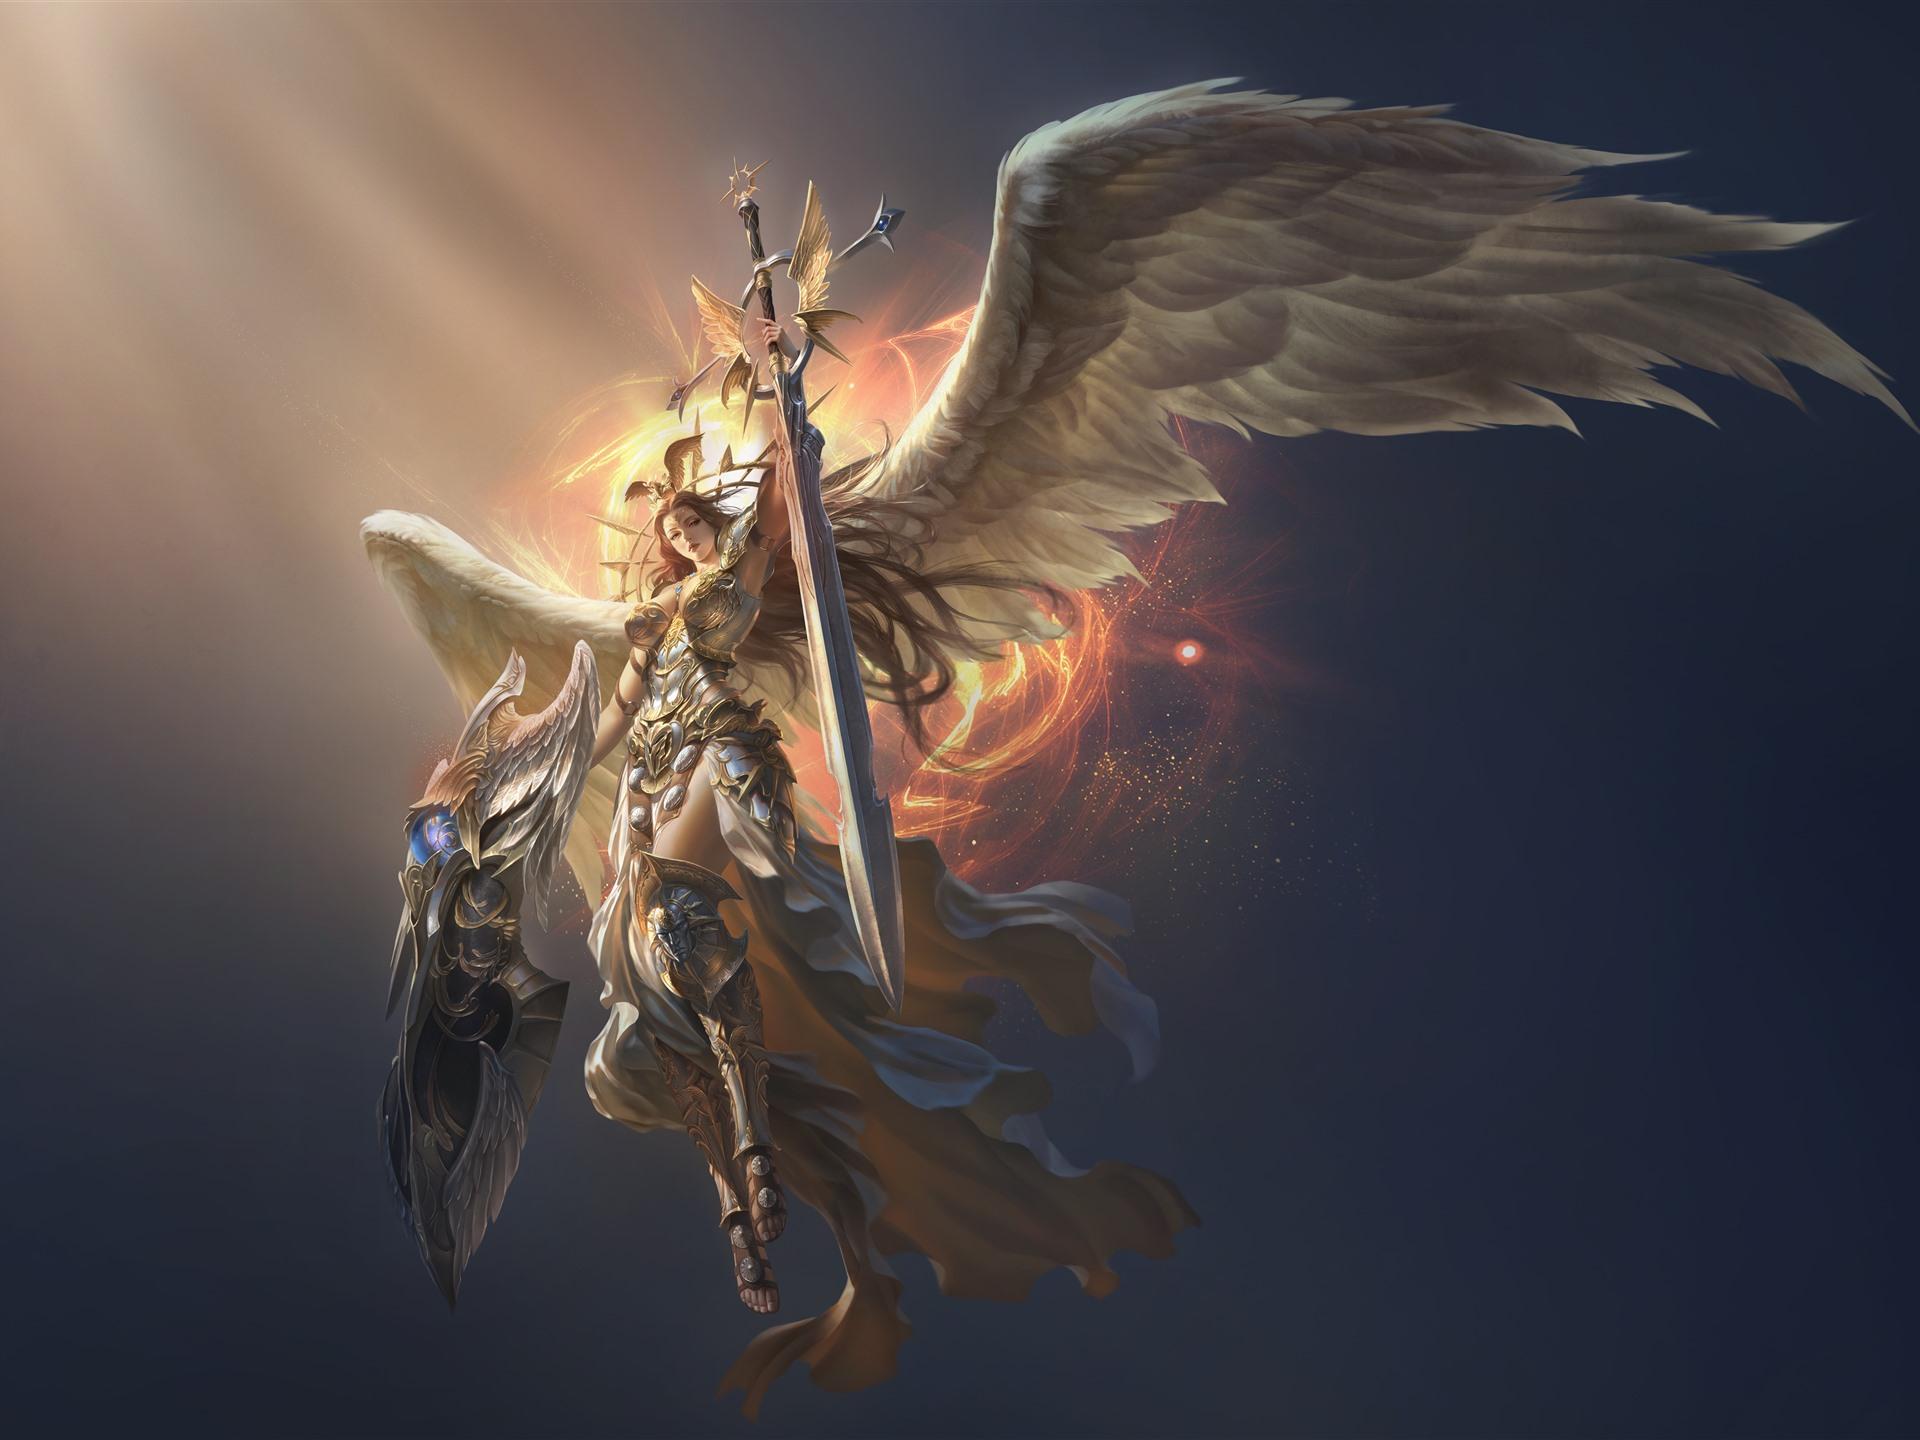 Wallpaper League Of Angels Beautiful Angel Wings Sword